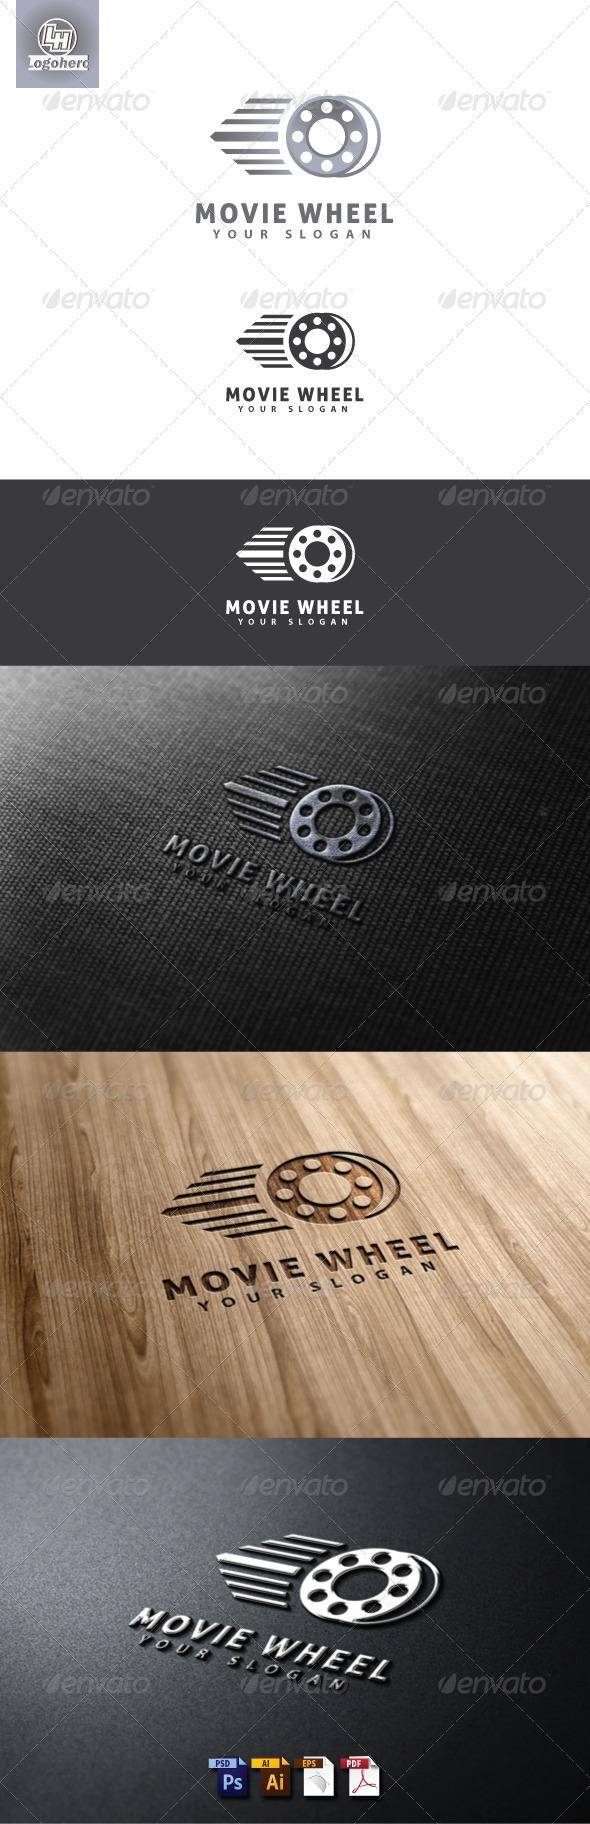 Movie Wheel Logo Template